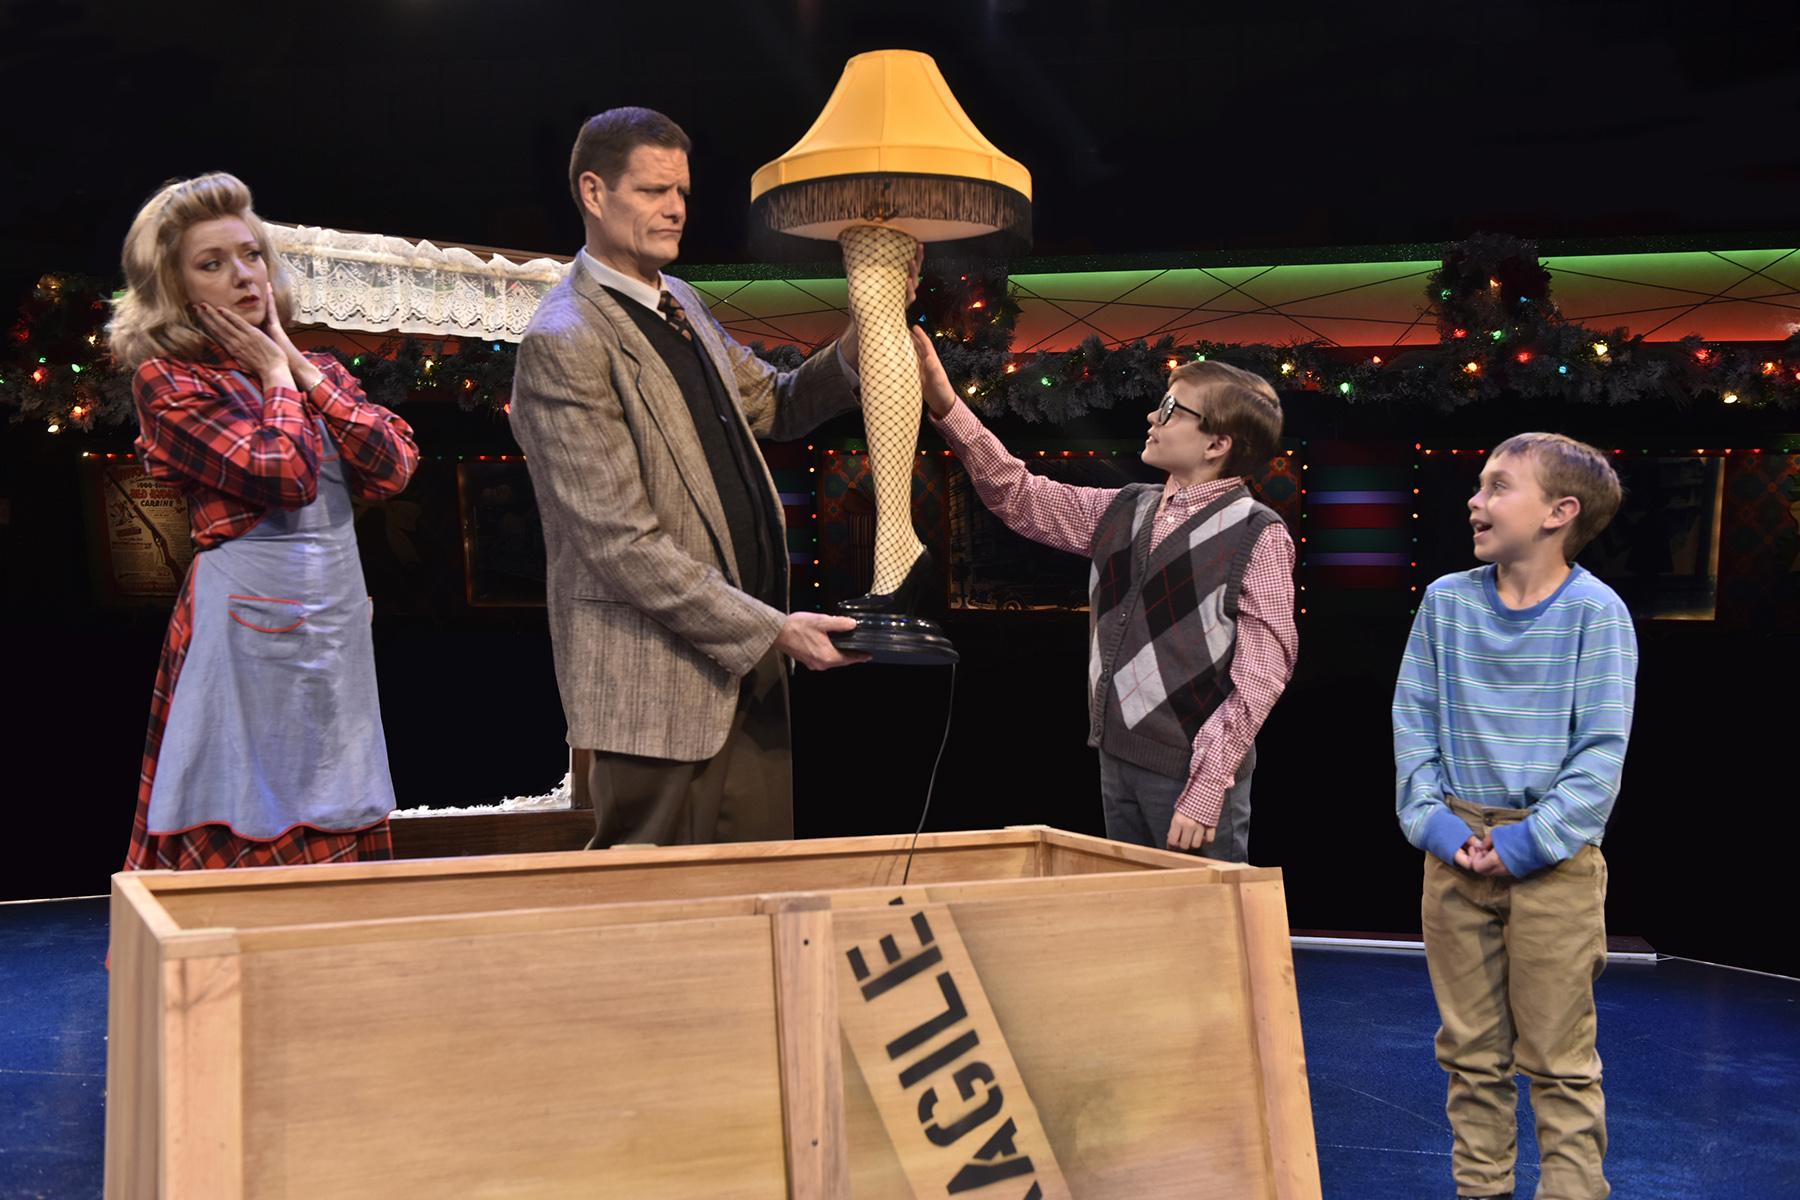 A Christmas Story leg lamp scene